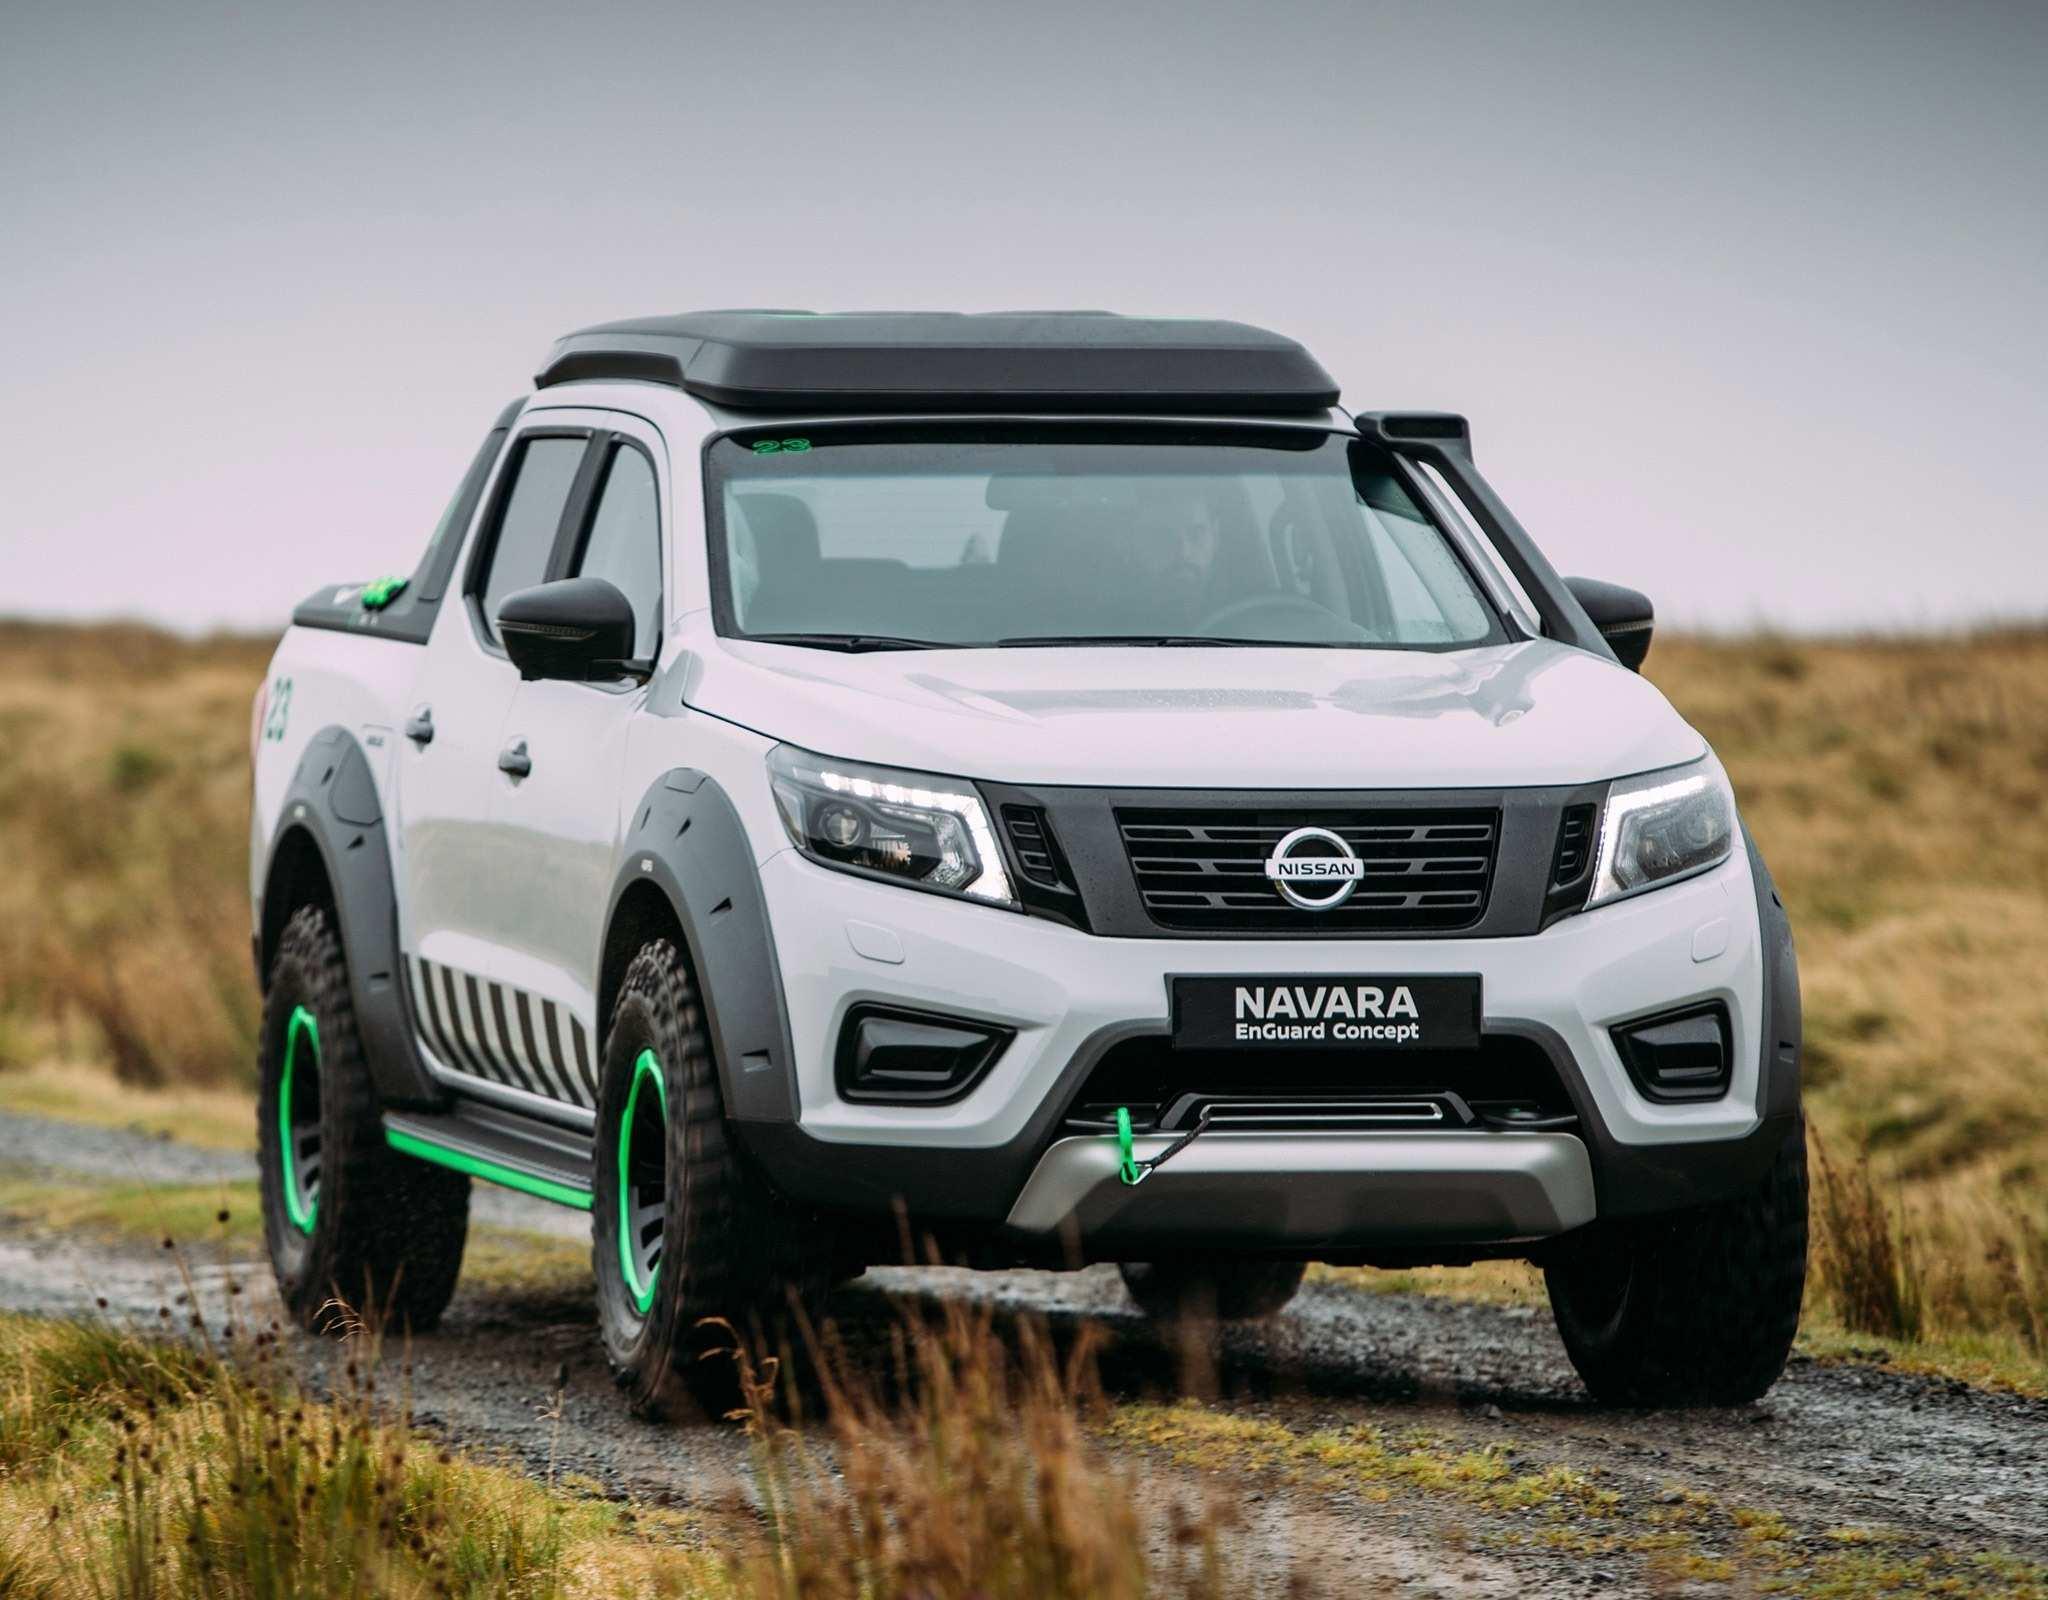 26 The 2020 Nissan Navara 2018 Review with 2020 Nissan Navara 2018